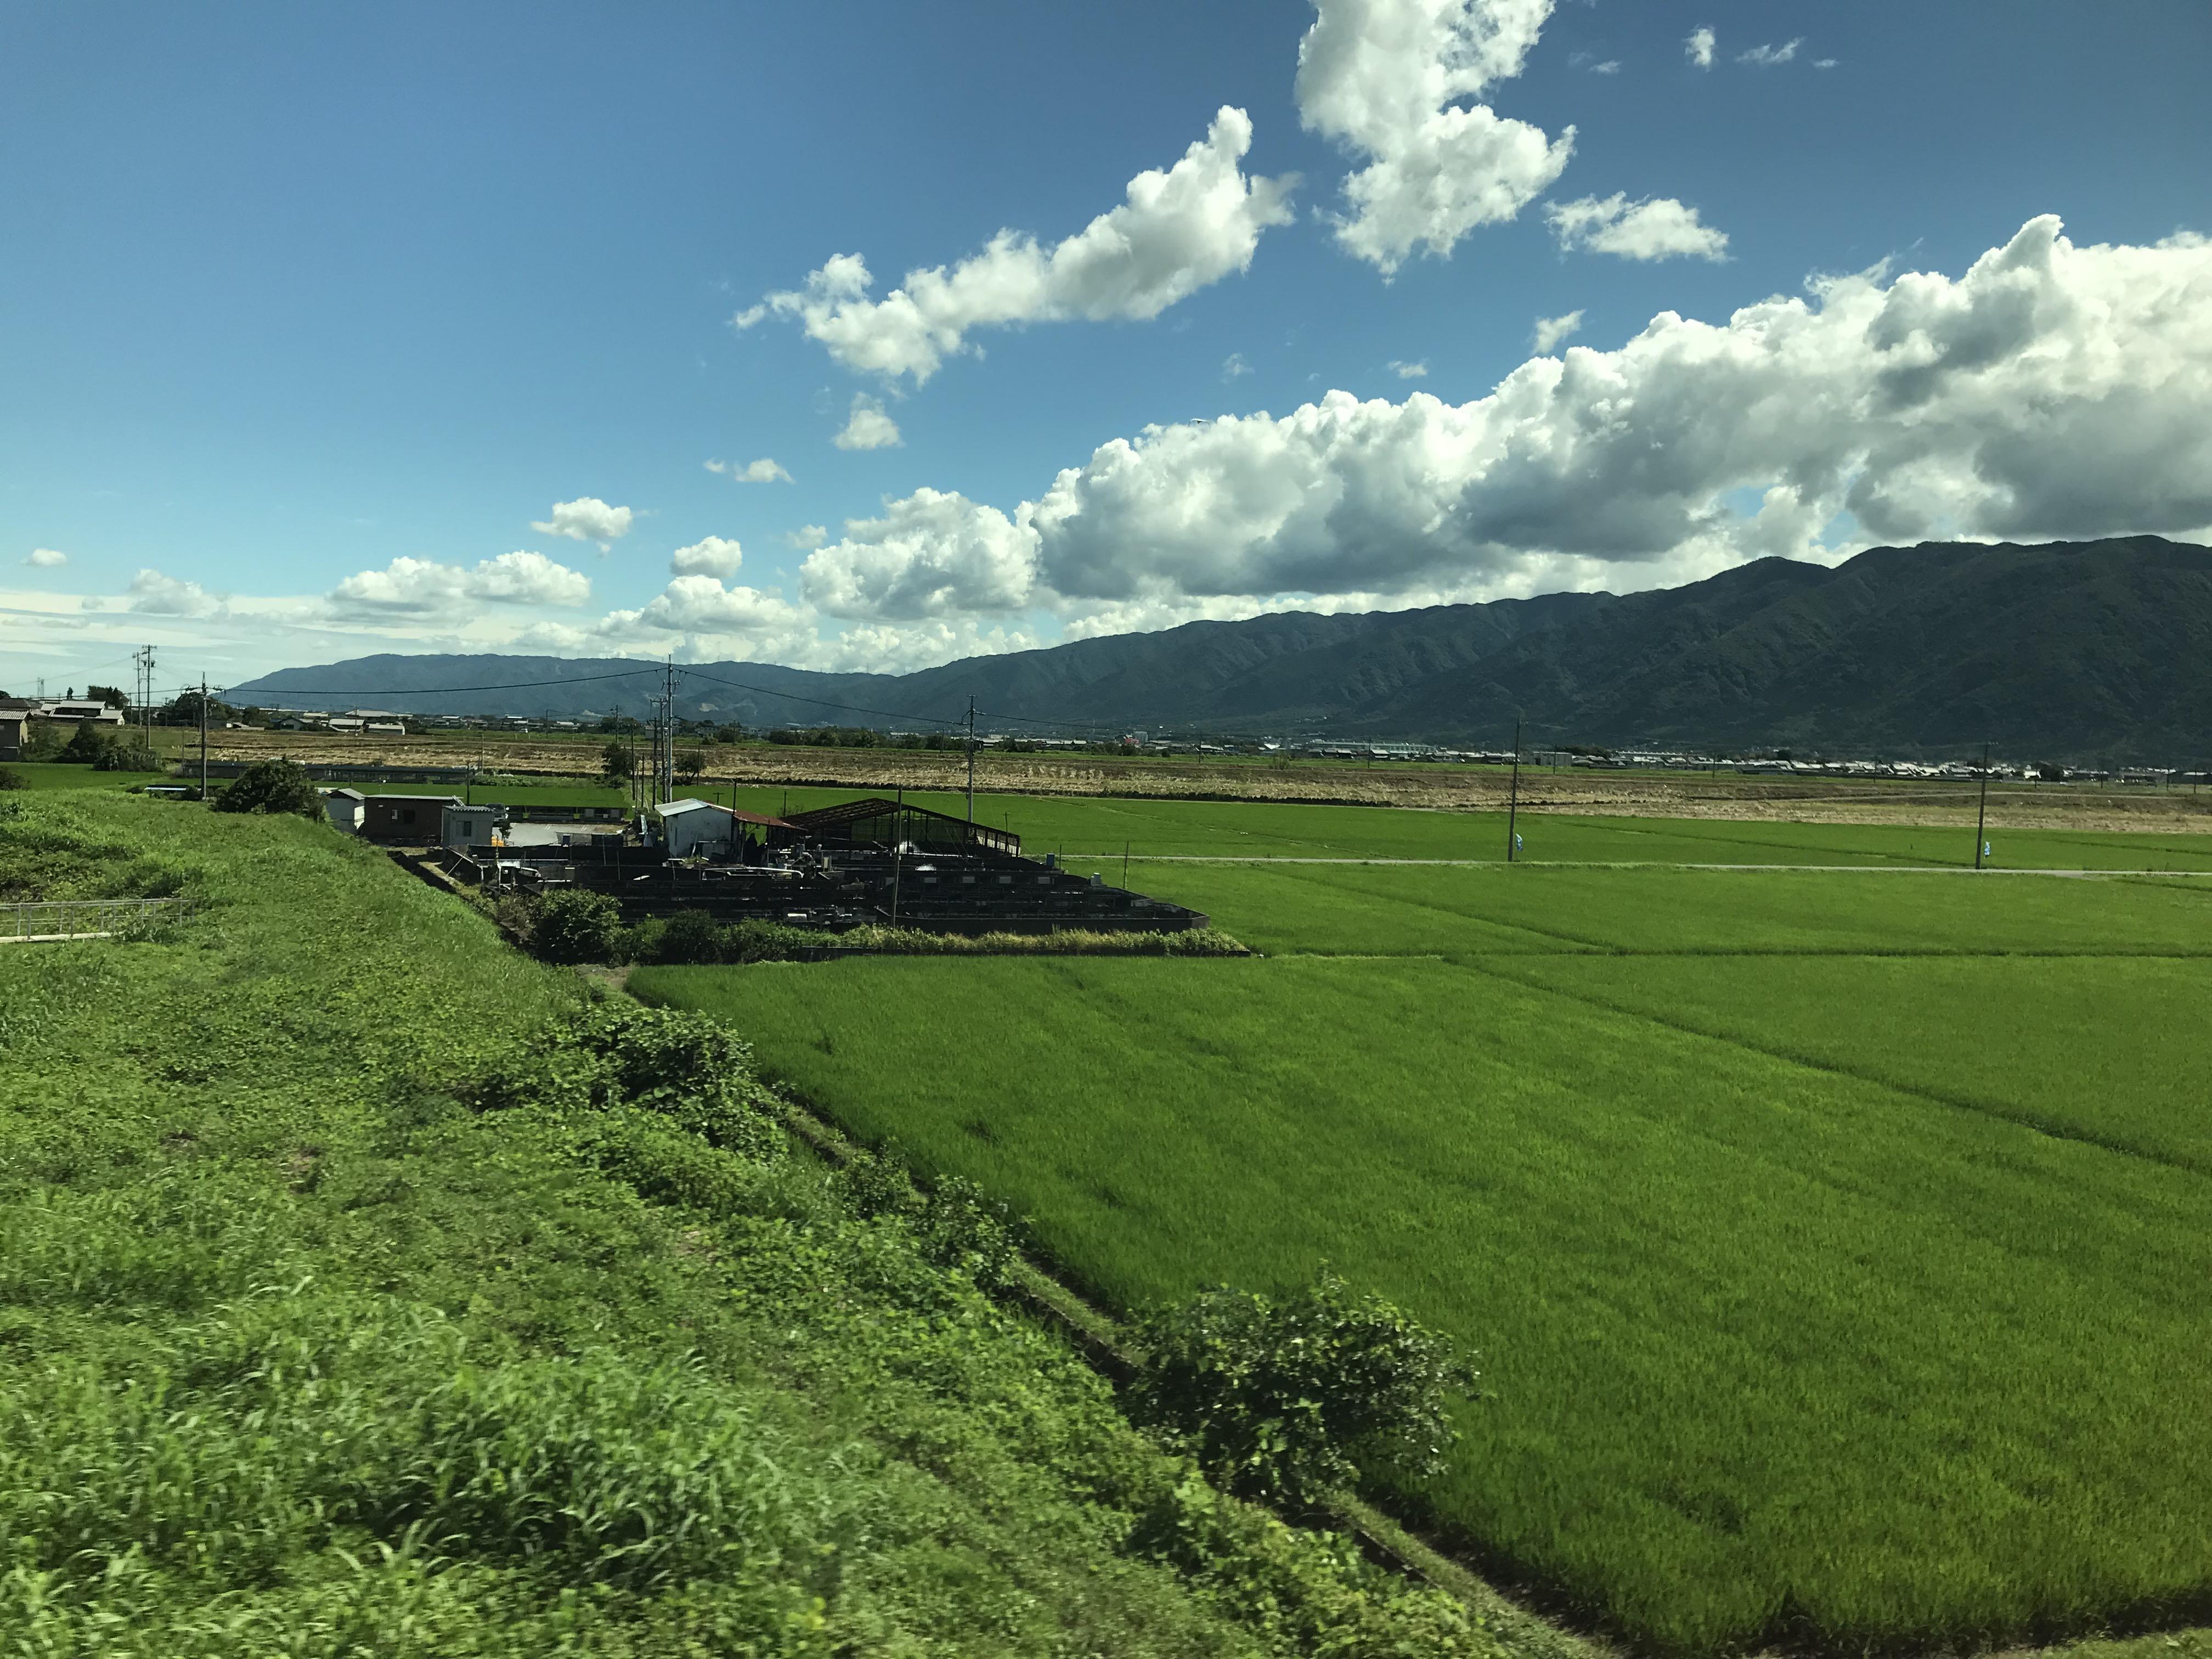 Gambar Jepang Sawah Hijau Padang Rumput Langit Pemandangan Alam Bidang Bentang Alam Pegunungan Polos Bukit Lingkungan Alami Dataran Tinggi Daerah Pedesaan Banyak Lahan Gurun Gunung Tanah Pertanian Keluarga Rumput Musim Semi